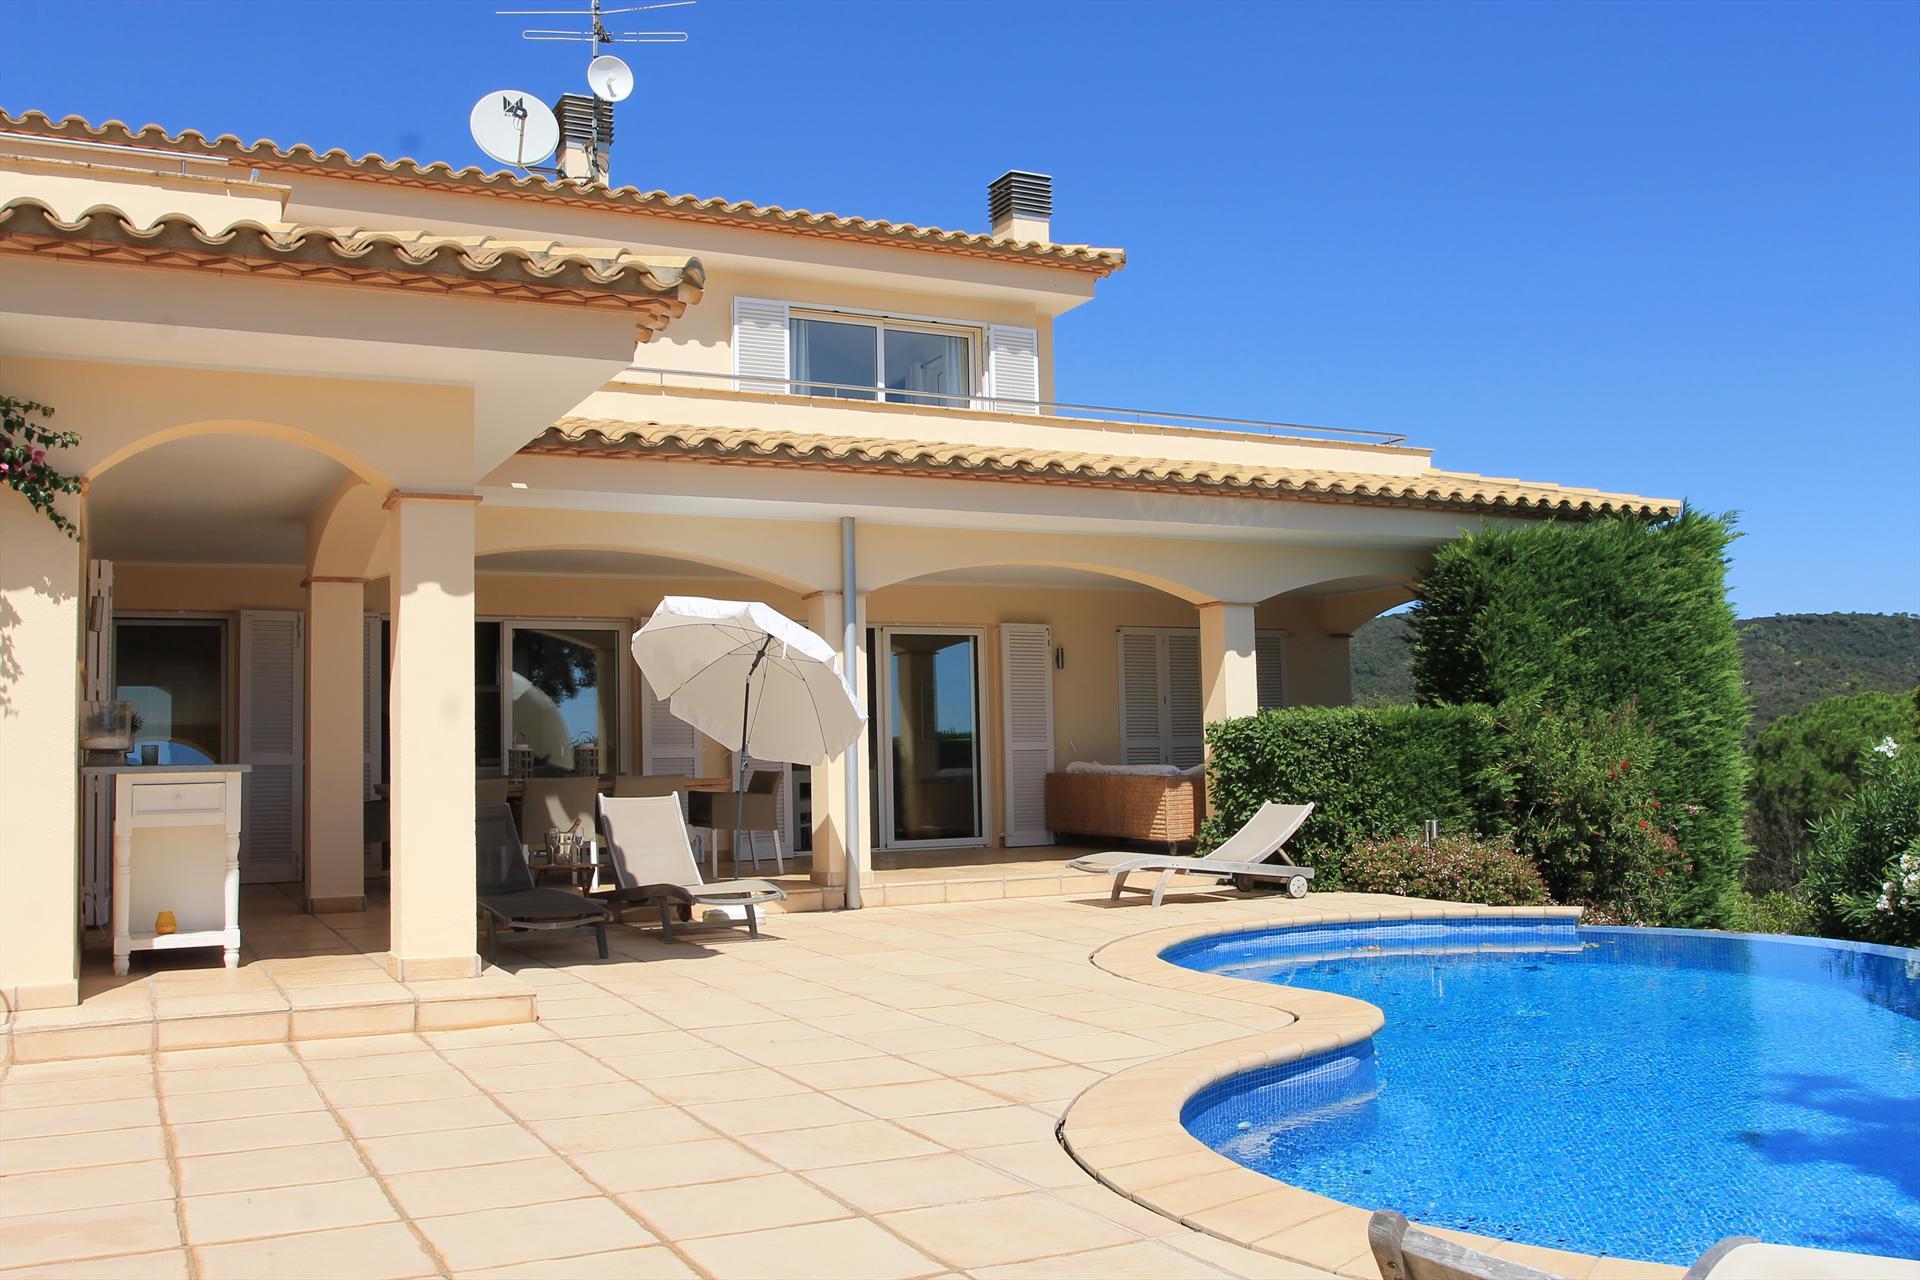 Villa mediterranea,Wonderful and cheerful villa in Calonge, Catalonia, Spain  with private pool for 6 persons...